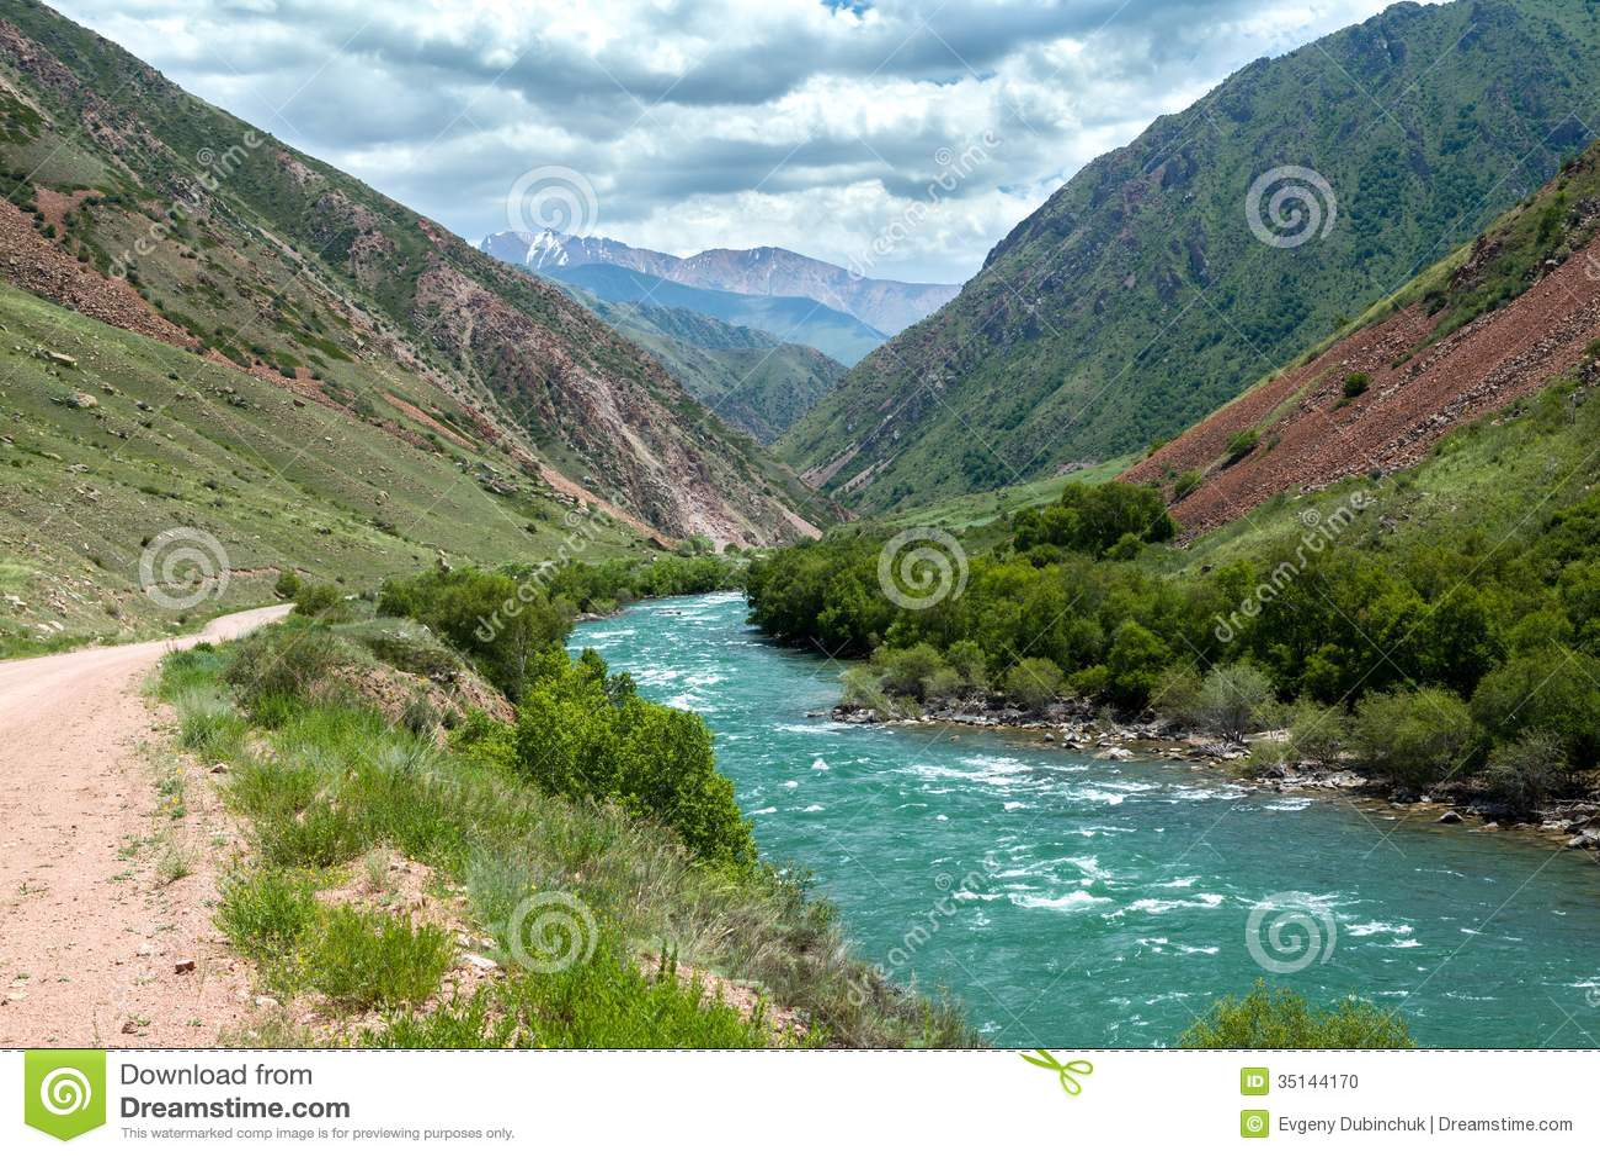 Turquoise River Kekemeren In Tien Shan, Kyrgyzstan Stock Photo ...